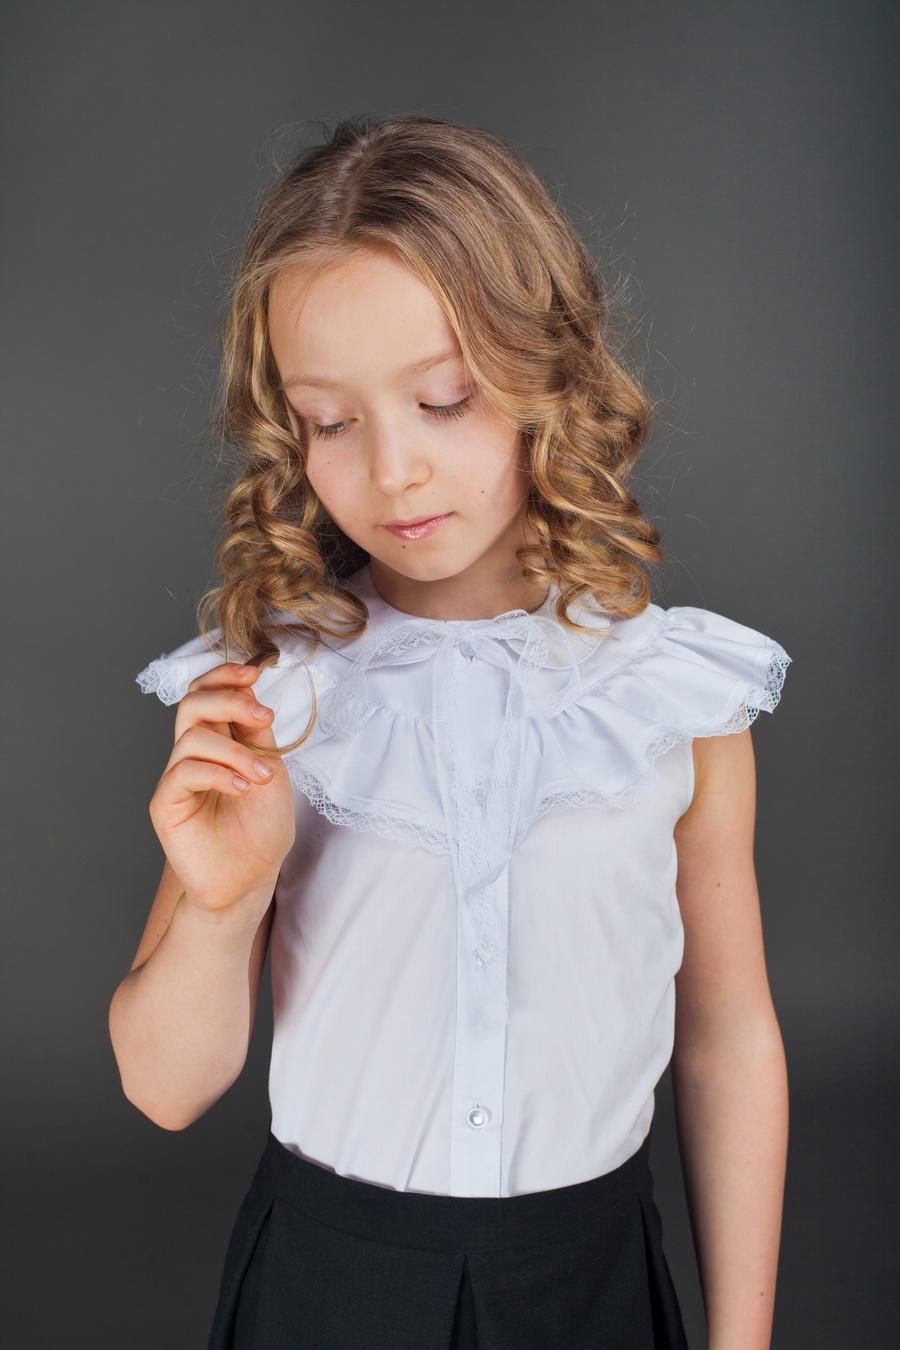 Блузка Для Девочки Своими Руками